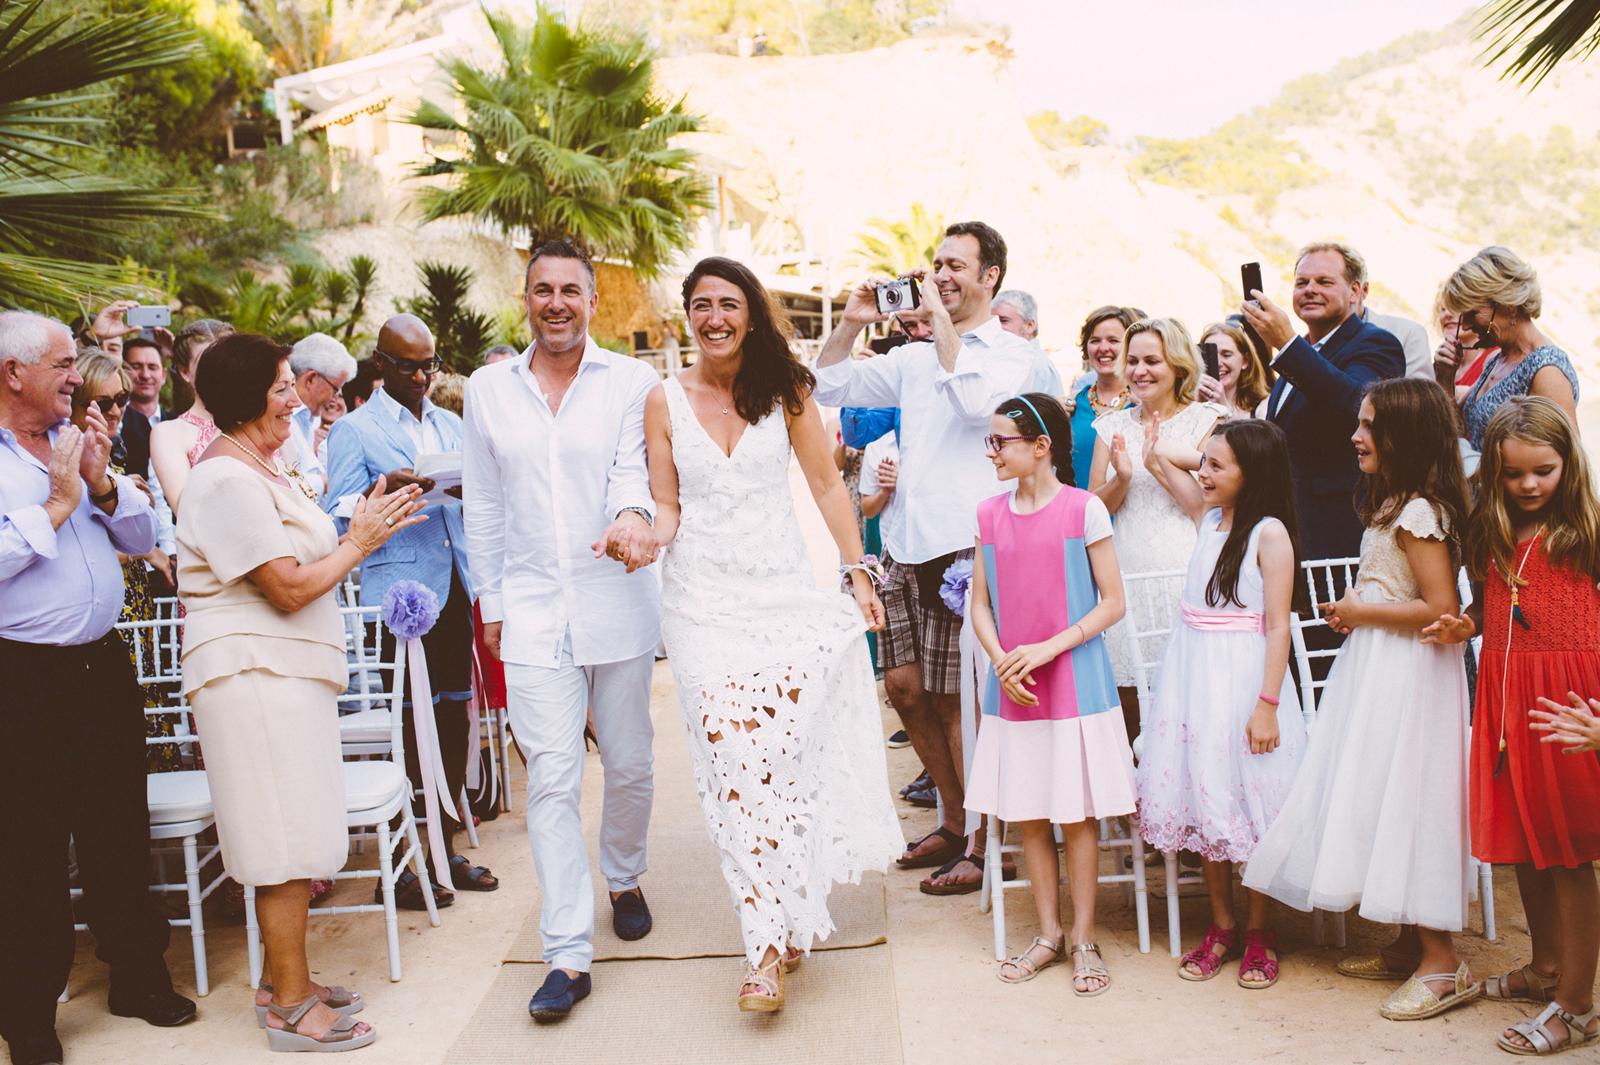 Hochzeitsfotograf_Ibiza_126.jpg